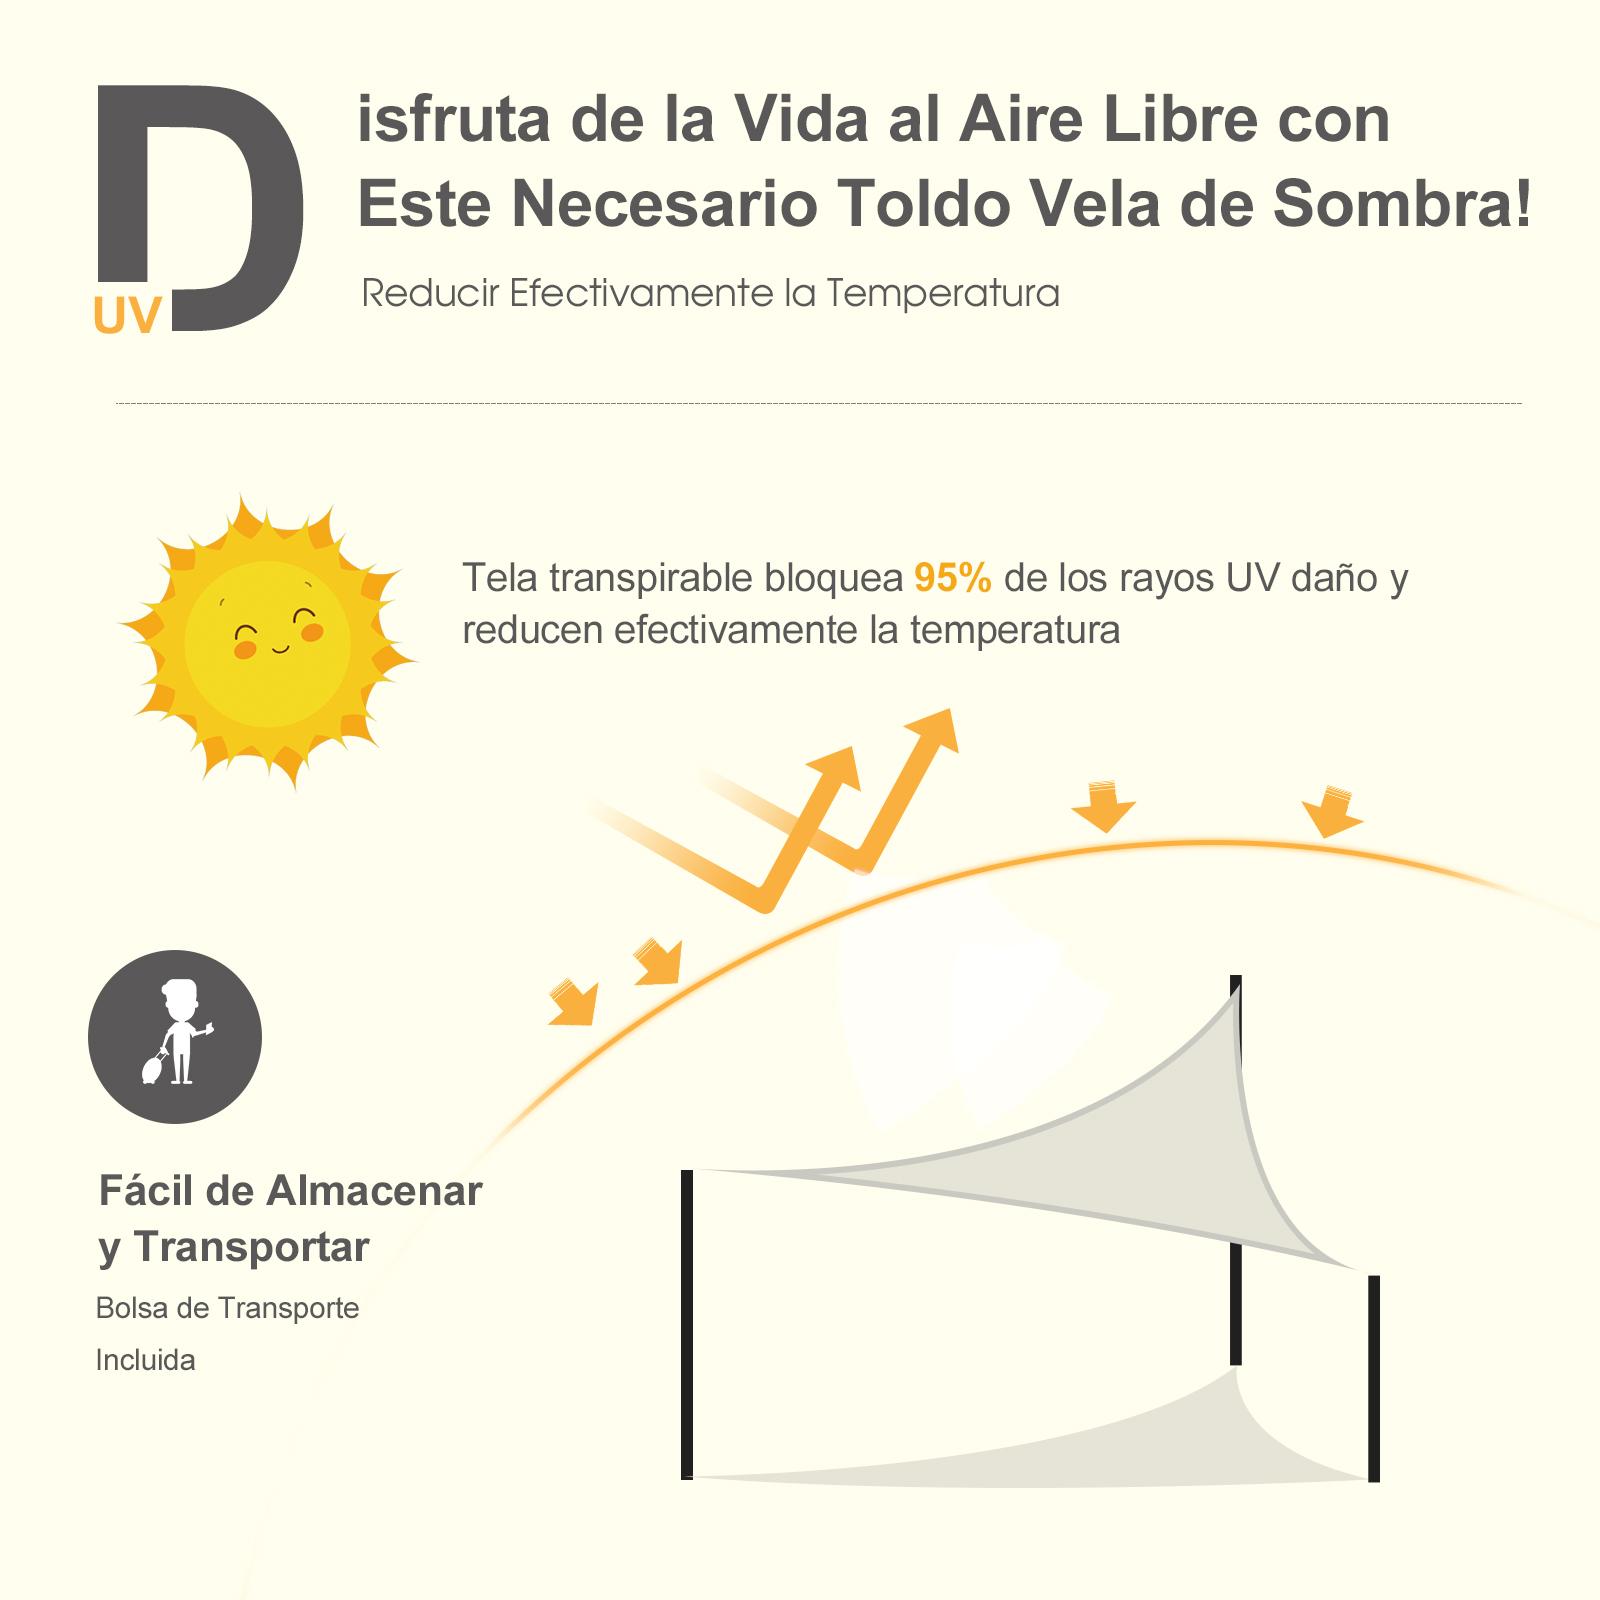 Toldo-Vela-Sombrilla-Parasol-Triangulo-Tejido-de-Poliester-185-g-m-Jardin-Playa miniatura 11